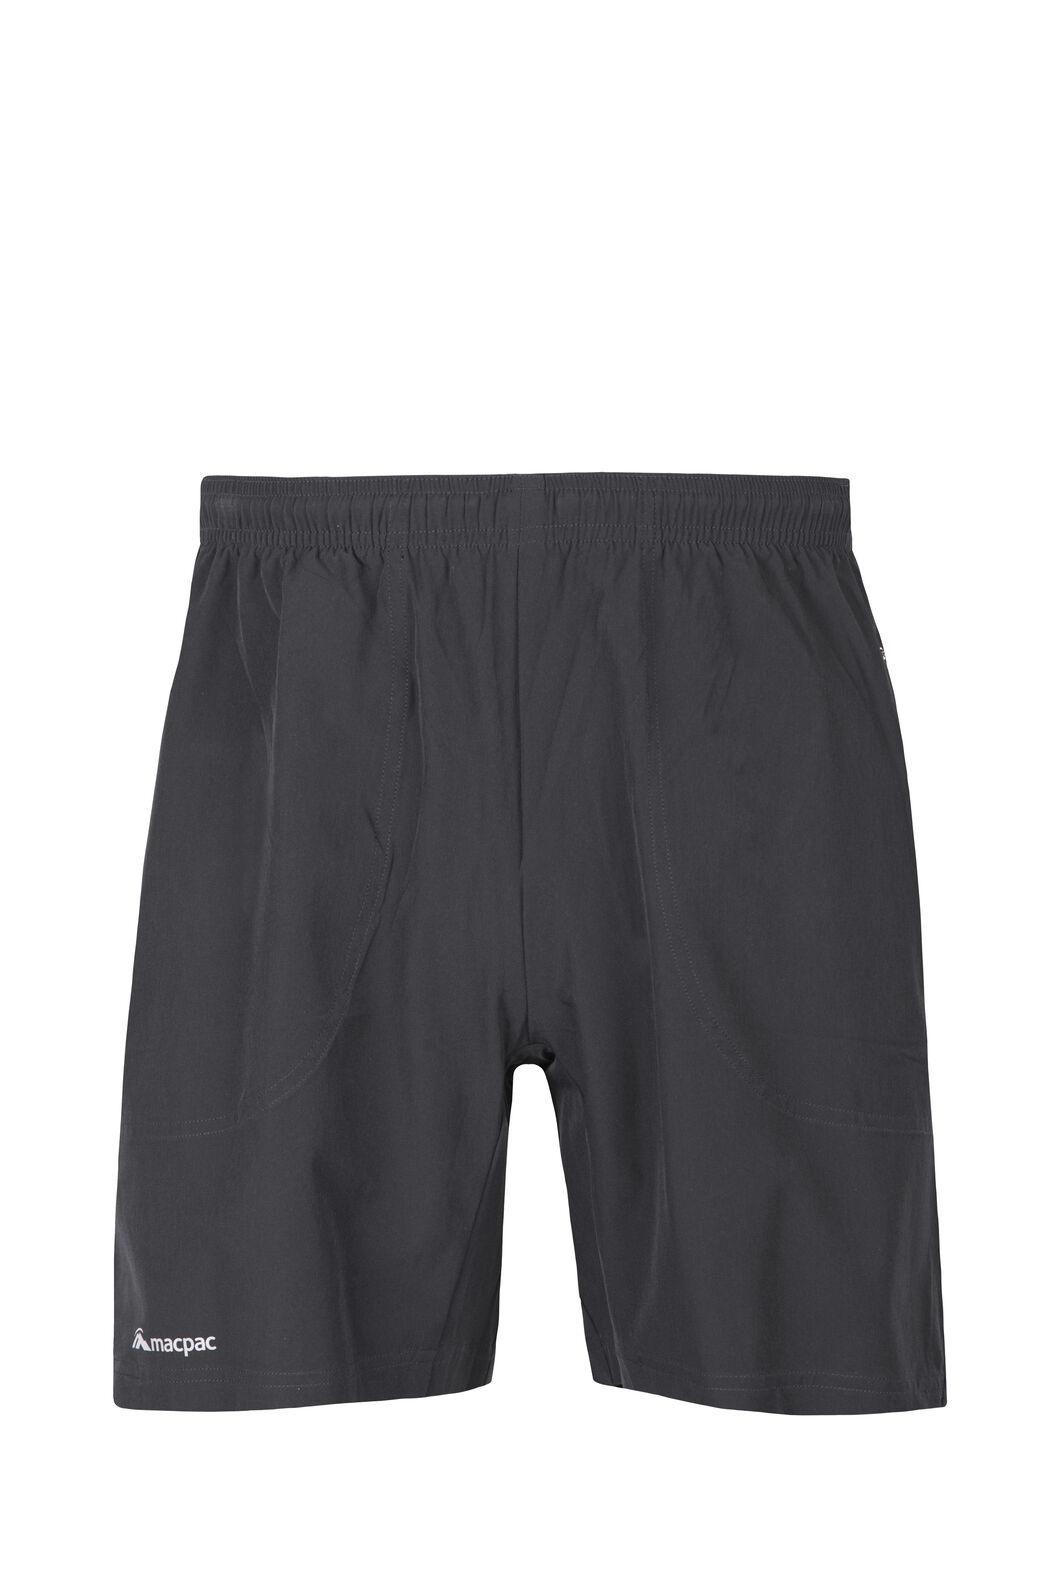 Macpac Fast Track Shorts — Men's, Black, hi-res